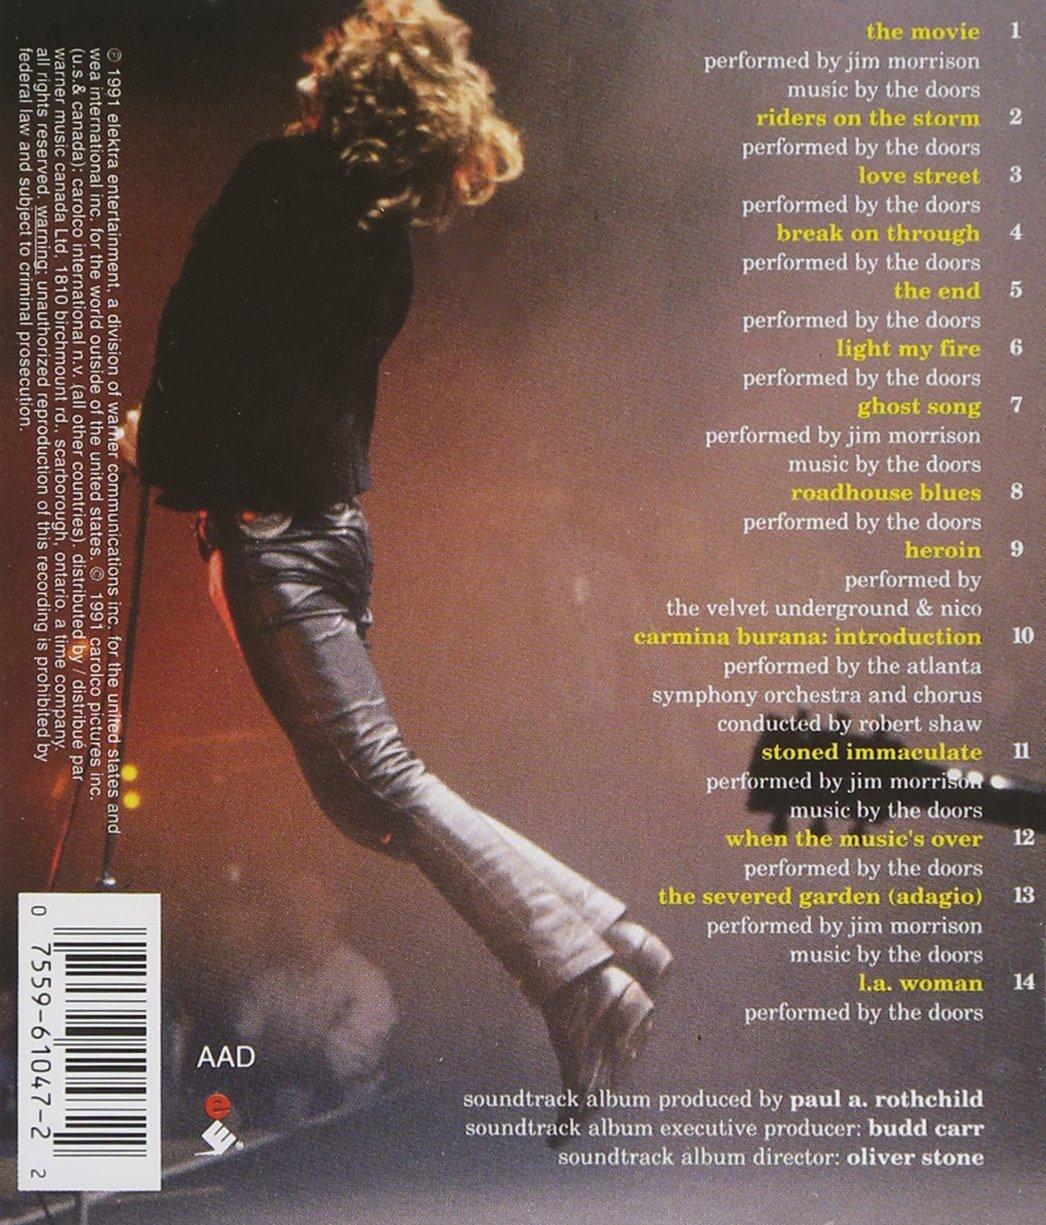 & The Doors - The Doors Original Soundtrack Recording - Amazon.com Music